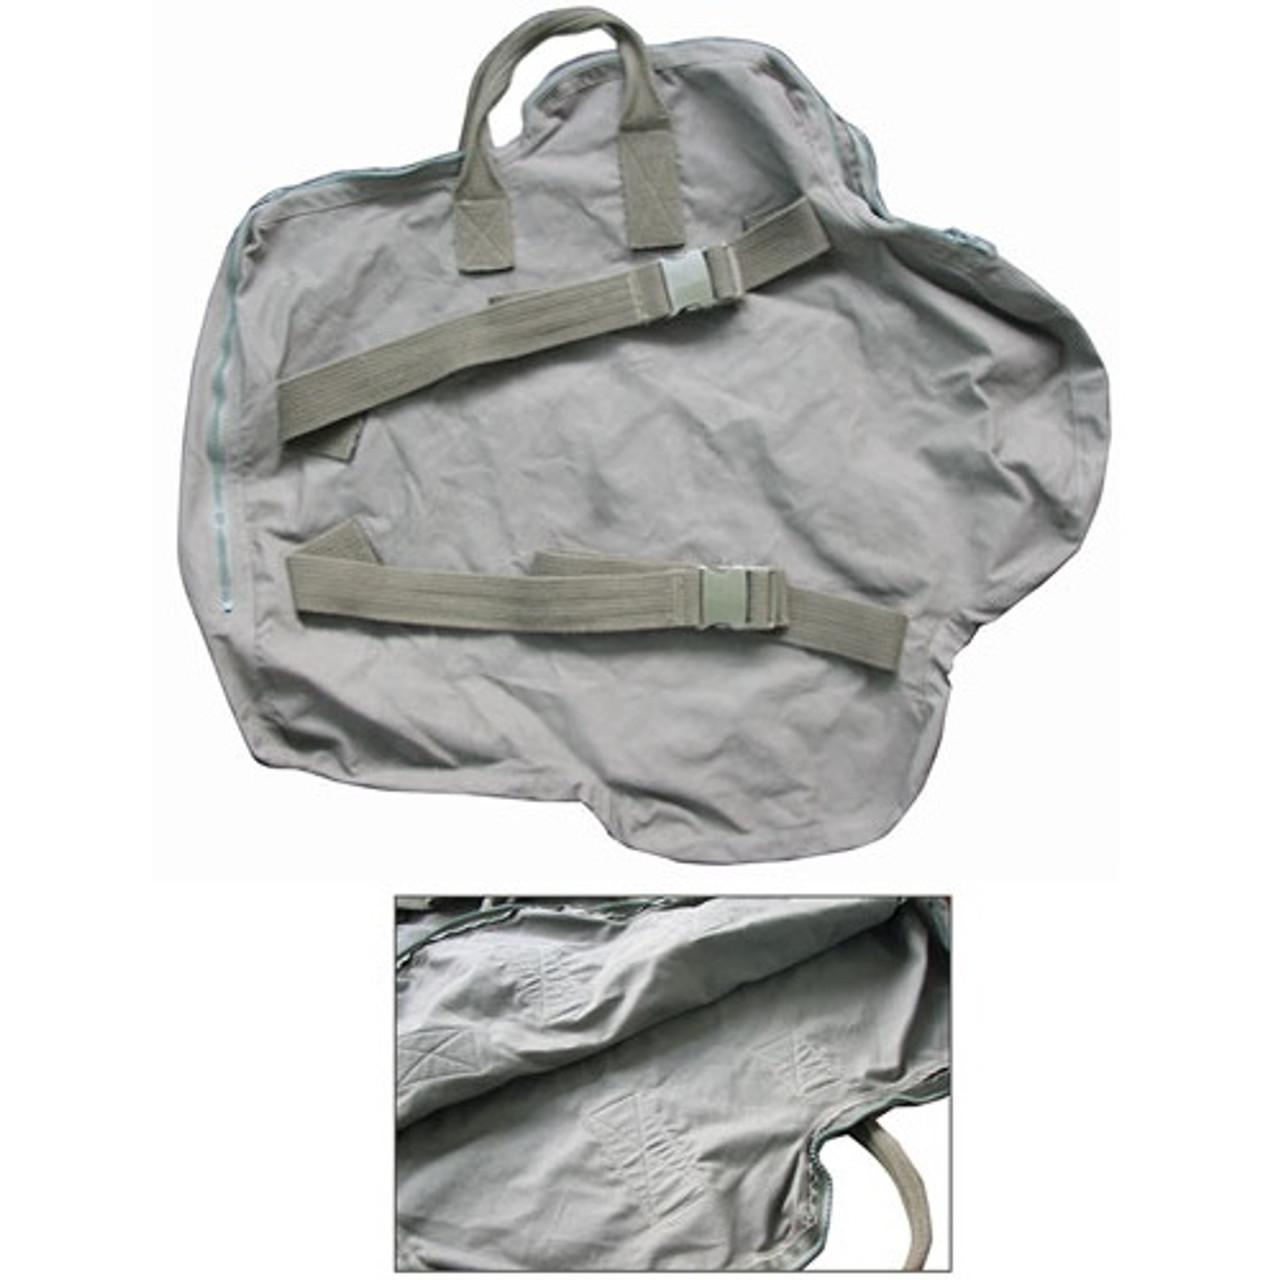 Surplus French Military Bag